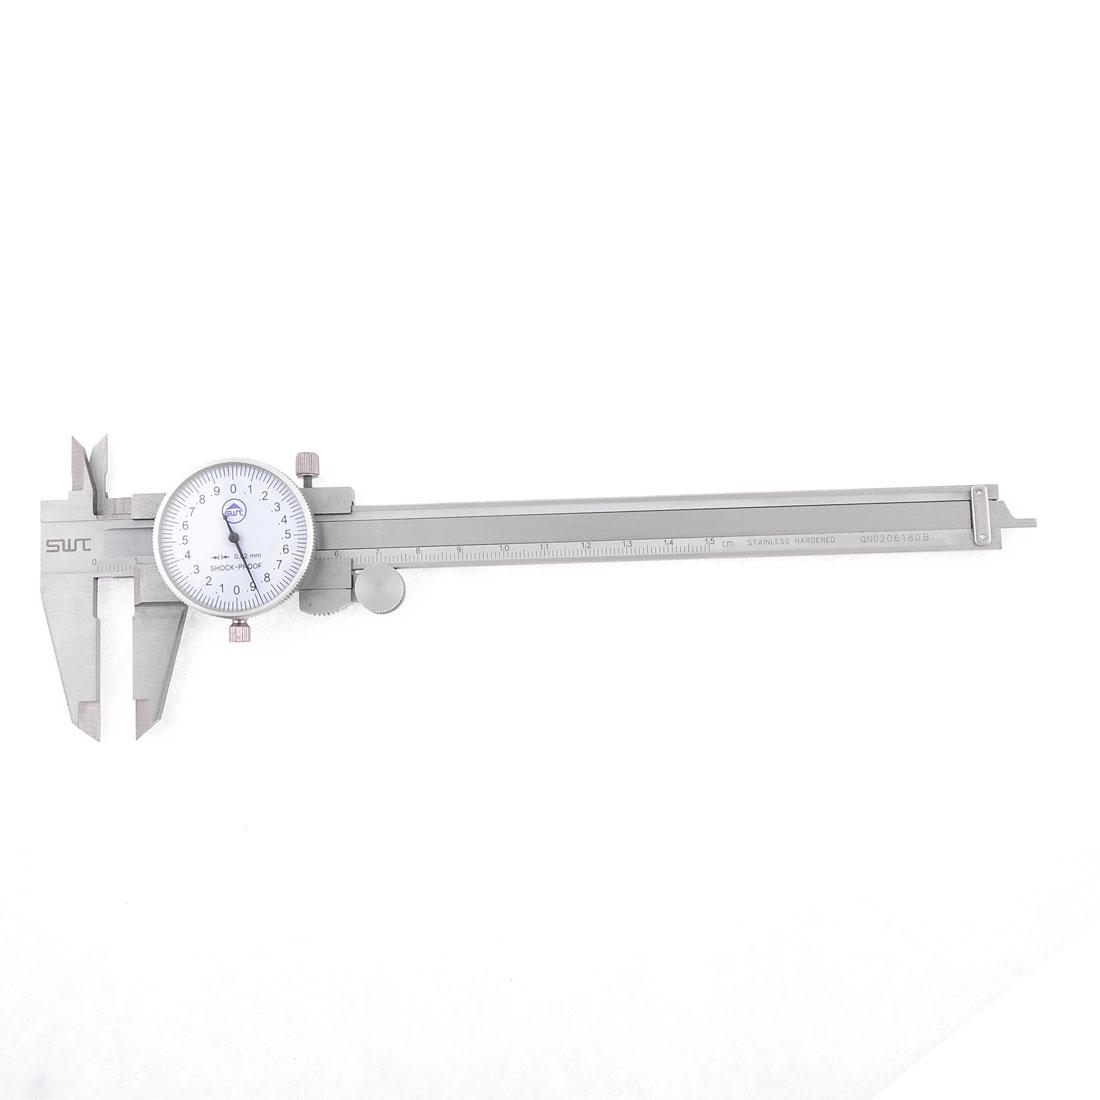 Stainless Steel Measurement Gauge Tool Dial Vernier Caliper 150mm 0.02mm